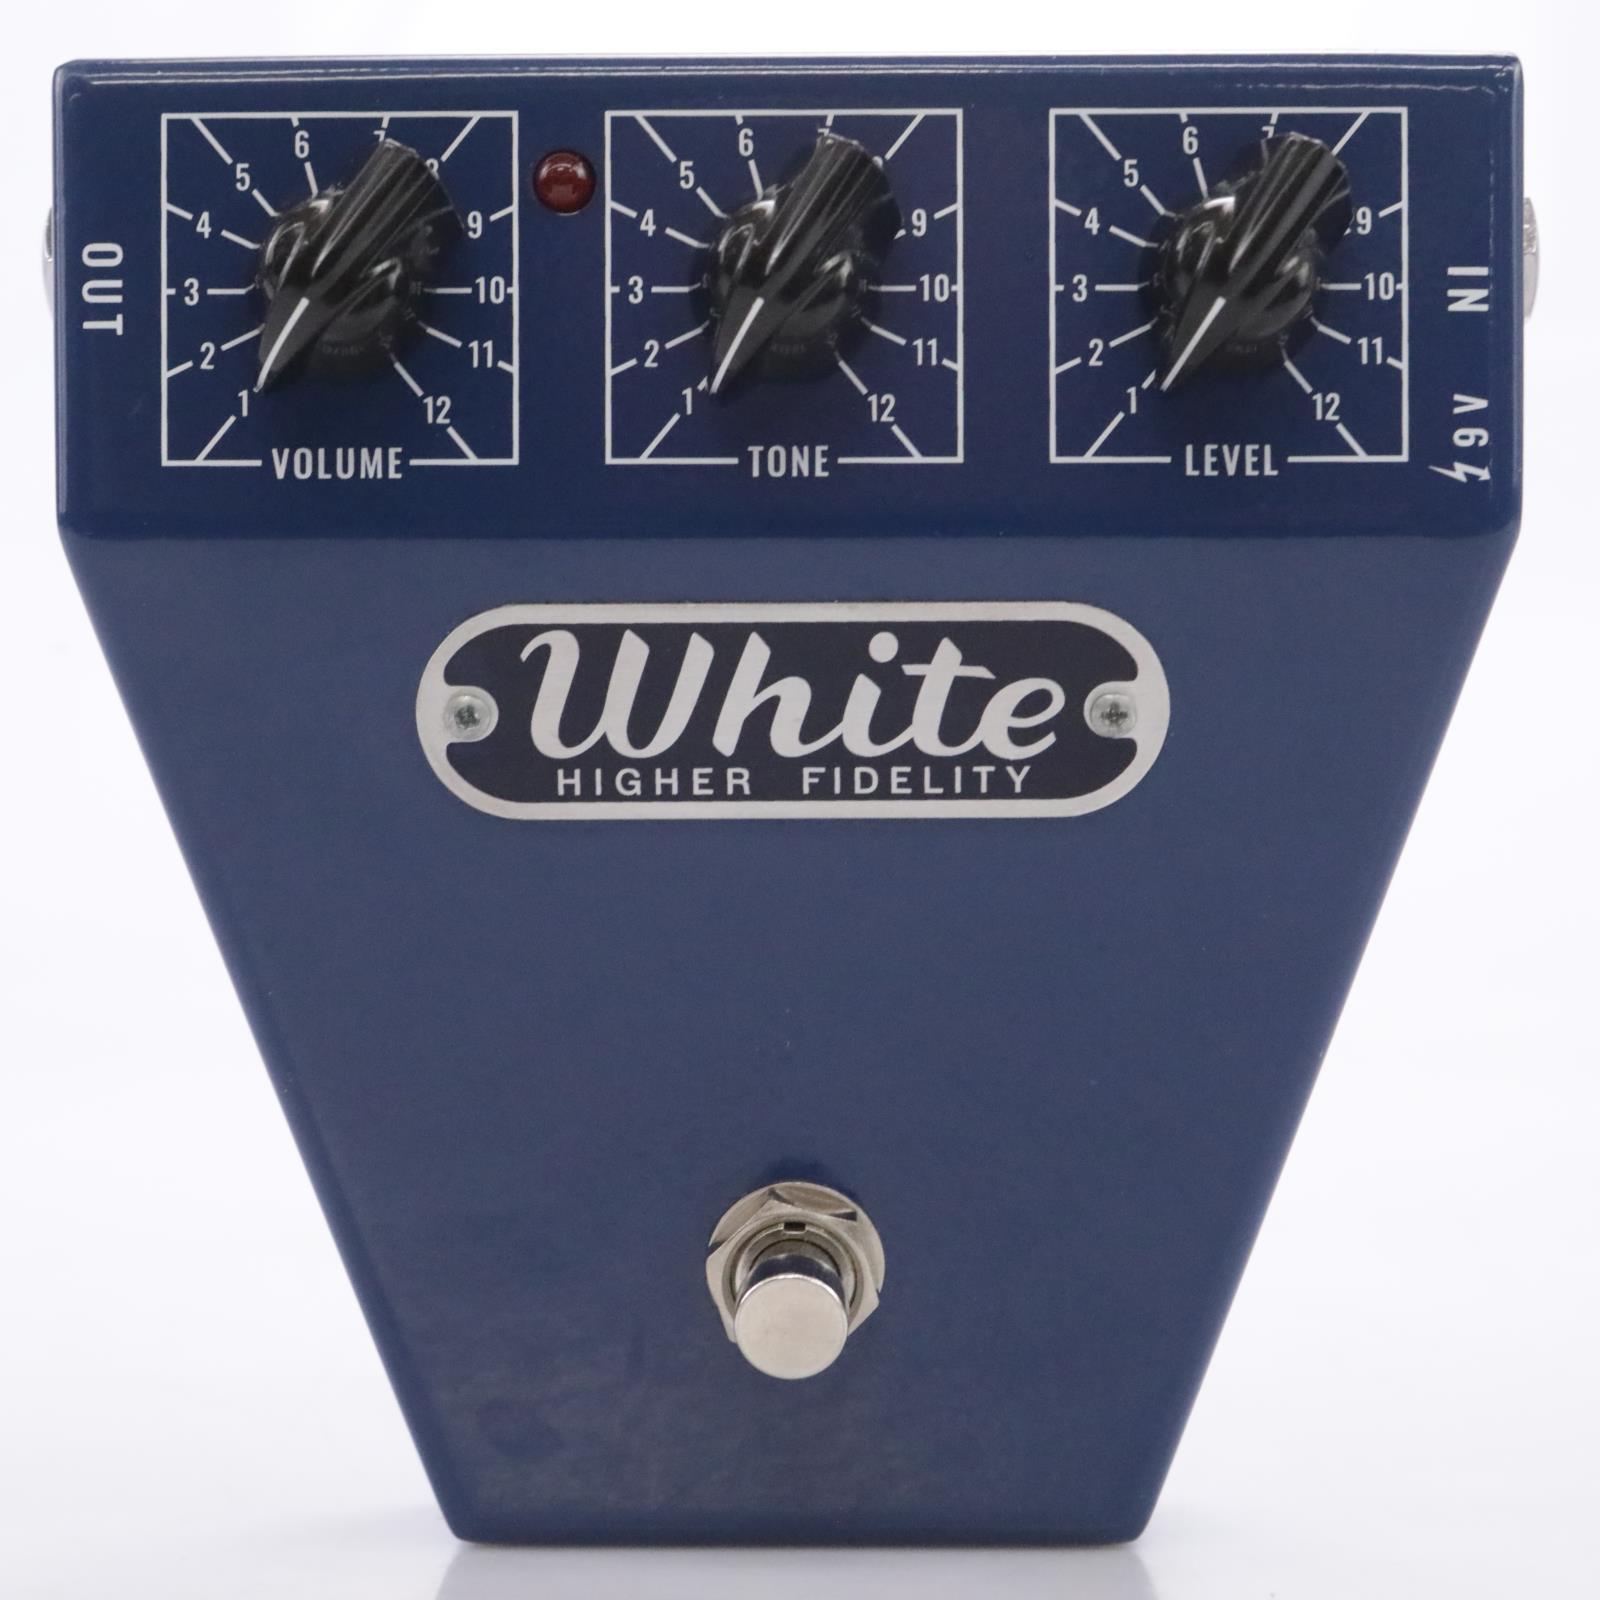 Satellite Amplifiers White Higher Fidelity Amp Emulator Pedal Stomp Box #43643